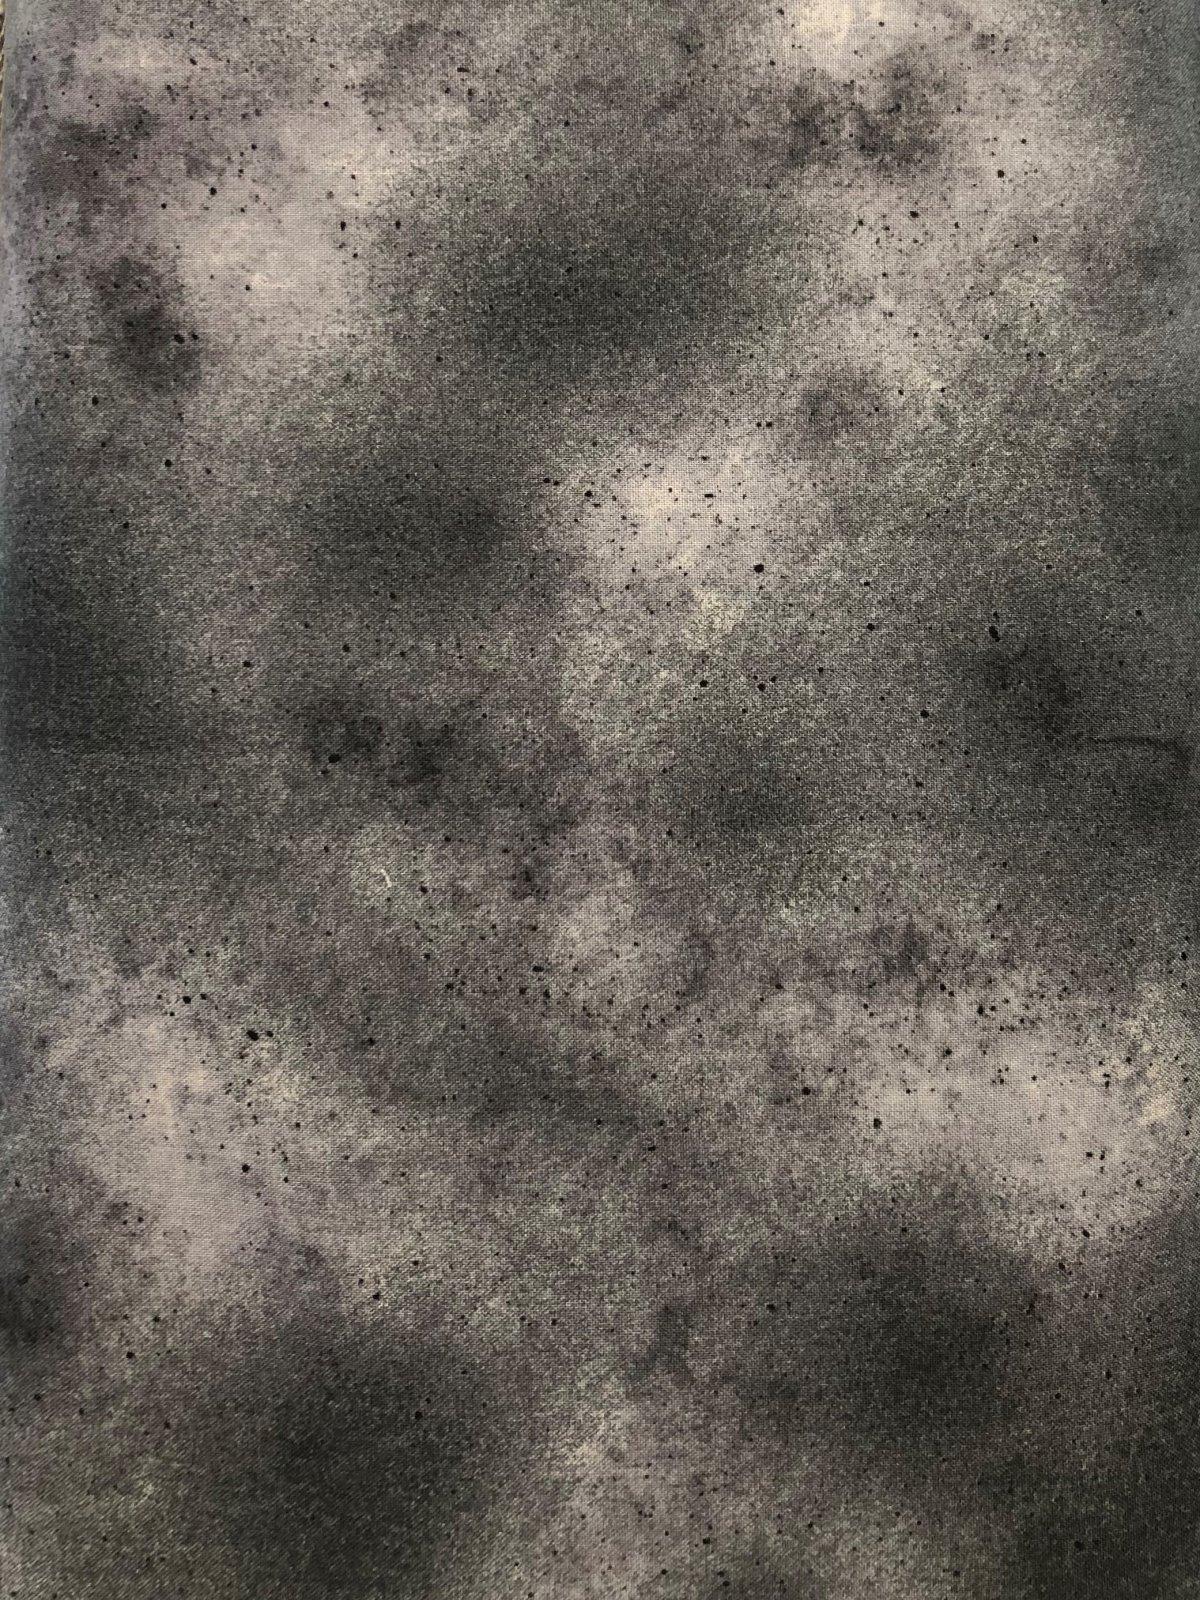 Kanvas New Hue Basic 8673-13 Charcoal Benartex '